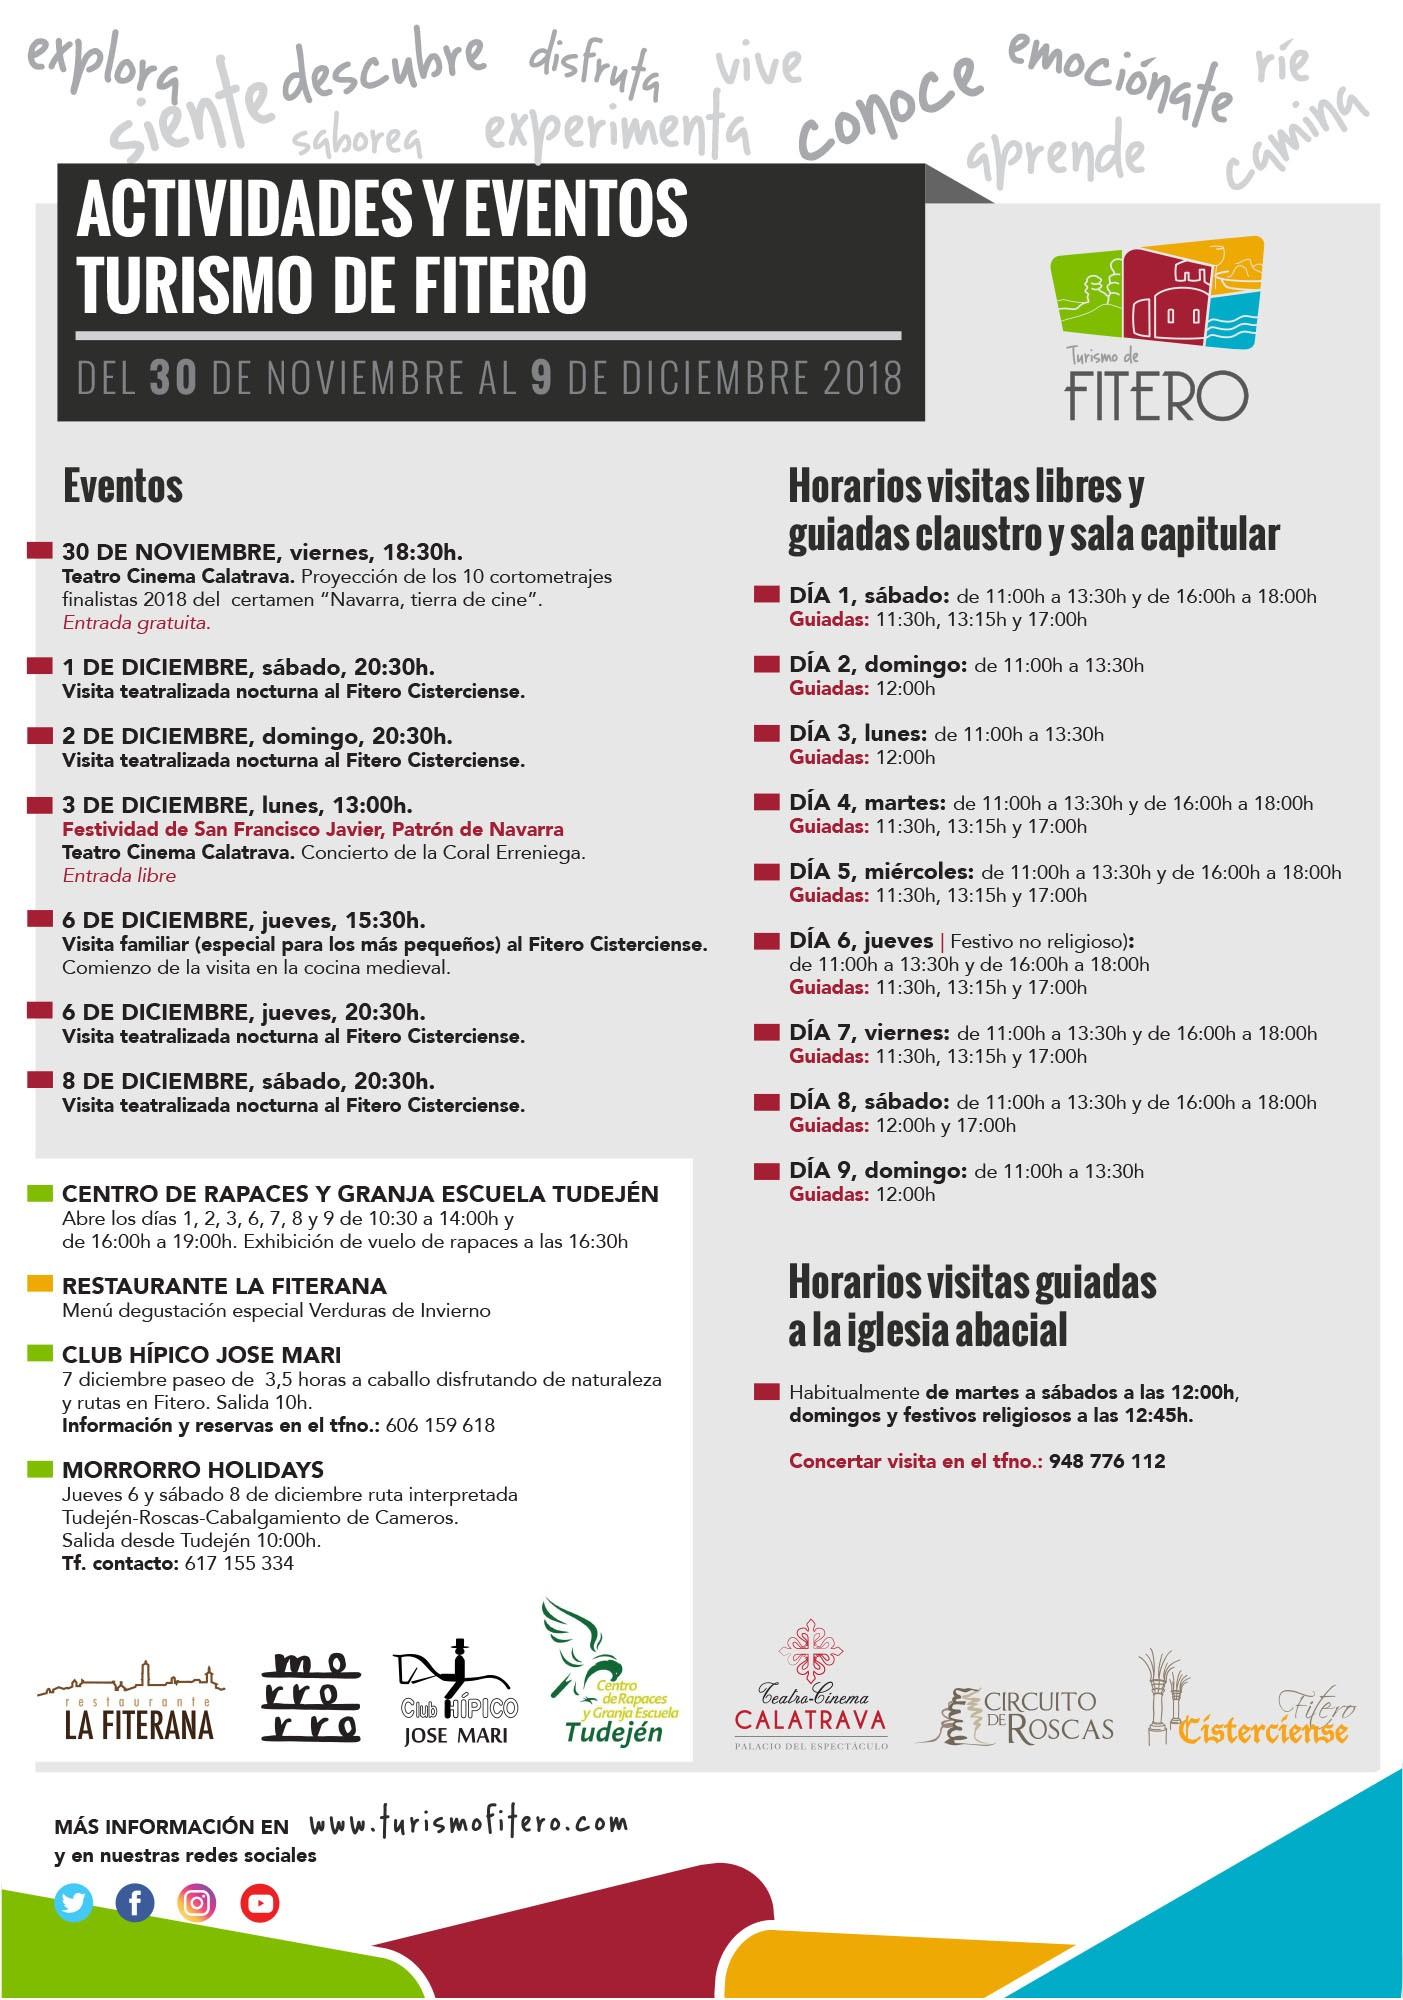 Calendario 2019 Festivos Aragon Más Actual Gastronoma – Turismo De Fitero Of Calendario 2019 Festivos Aragon Recientes Fitero Cisterciense – Turismo De Fitero